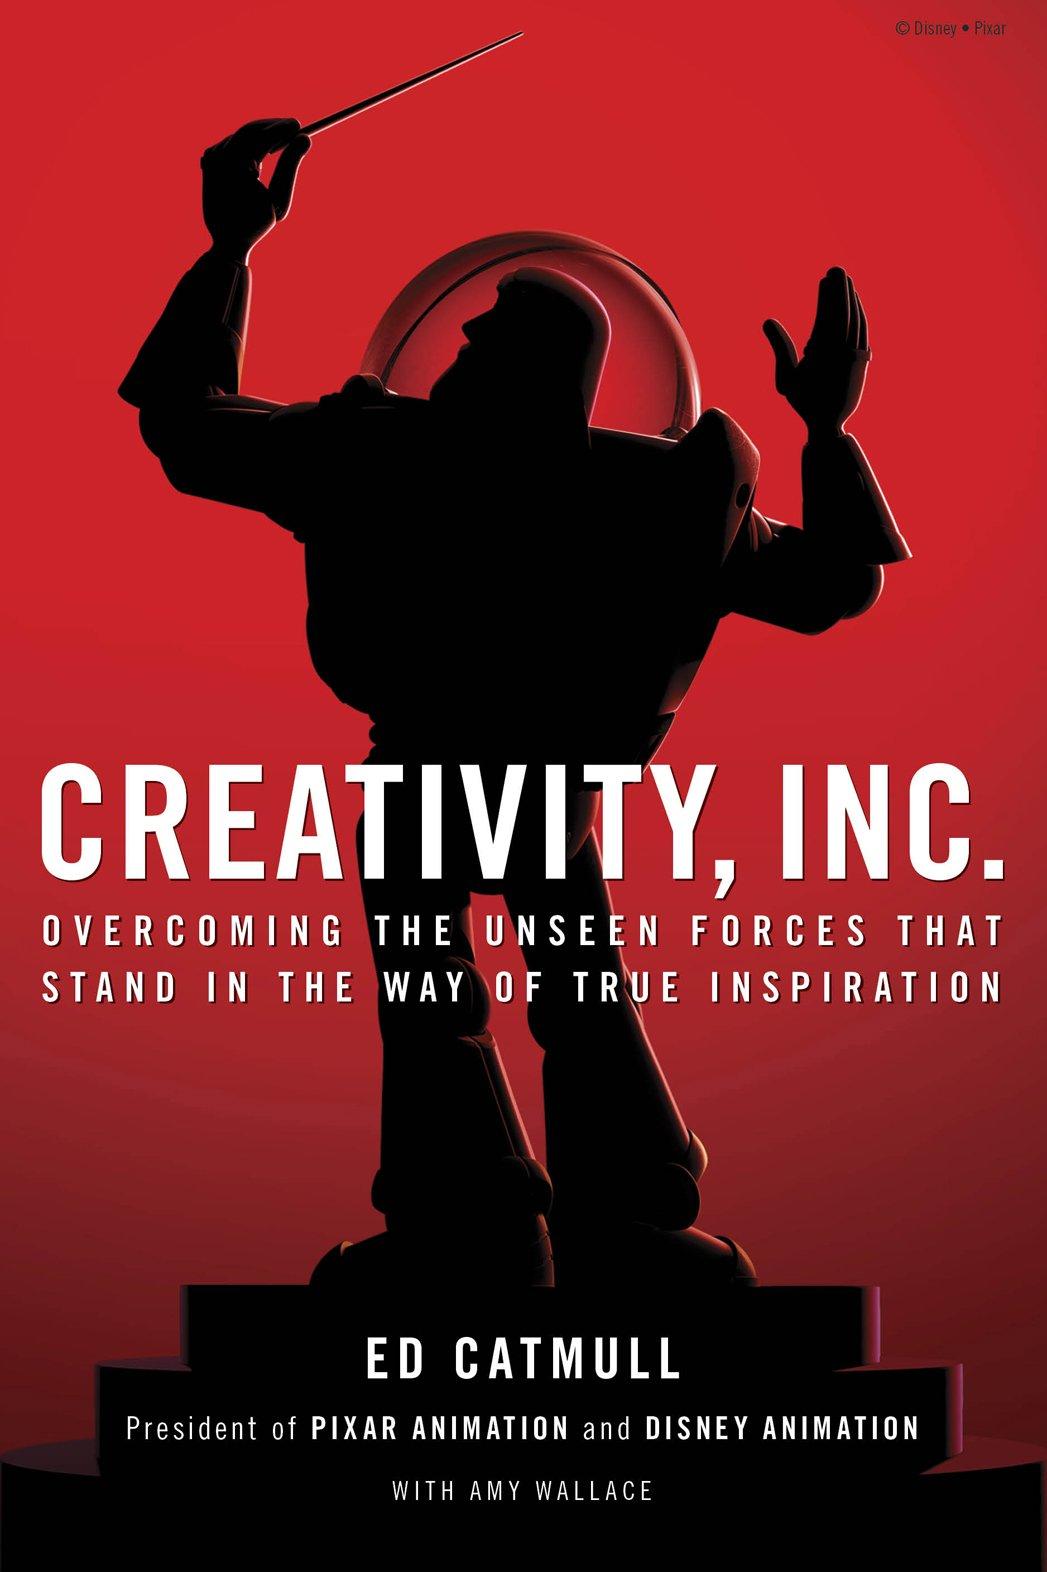 creativity-inc-book-cover